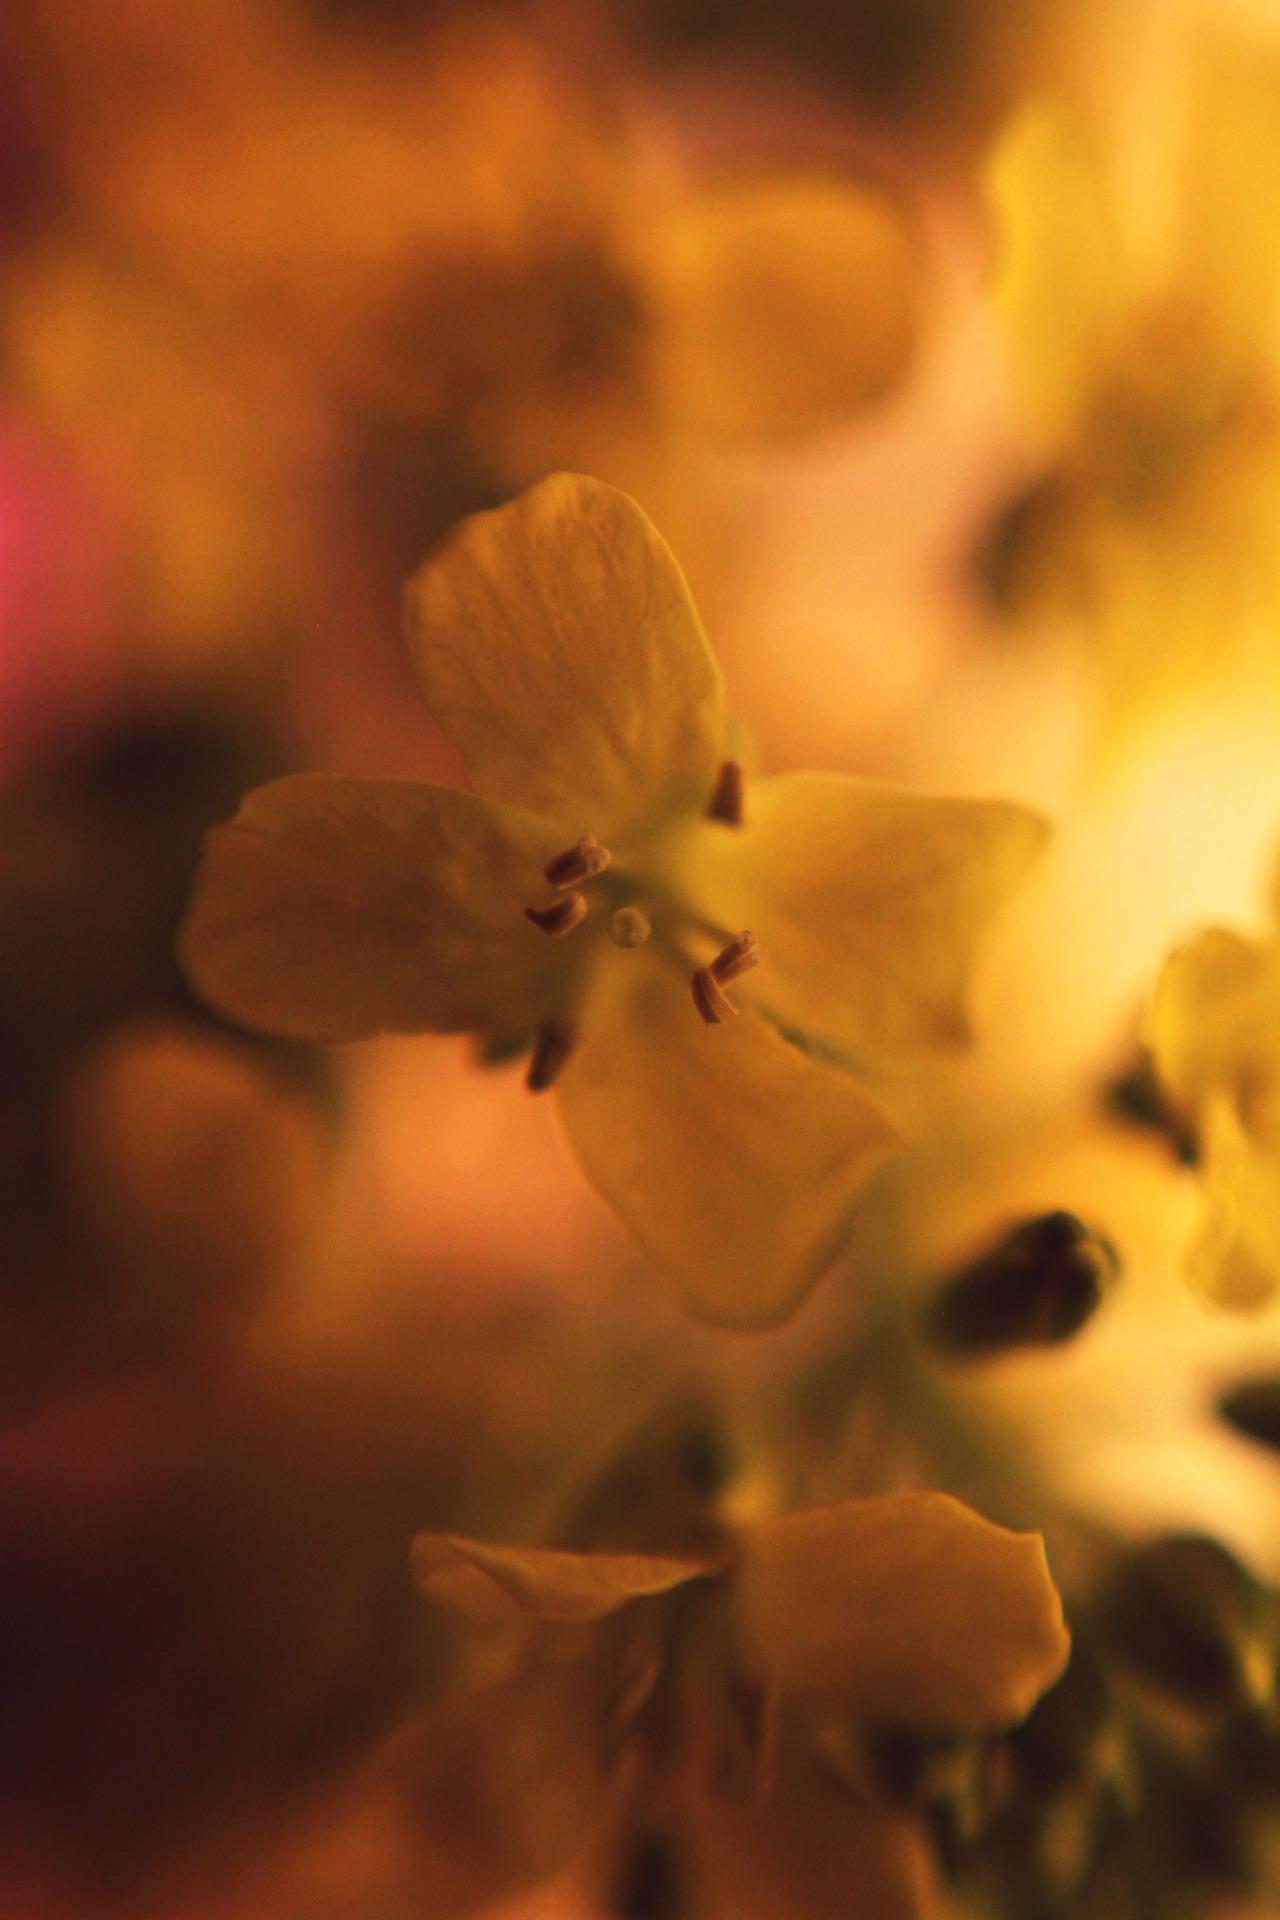 #photography#digital photography#macro photography #photographers on tumblr #original photographers#original photogrpahy#flowerporn#beauty#nature#flowers#spring#mood#tumblr#weheartit